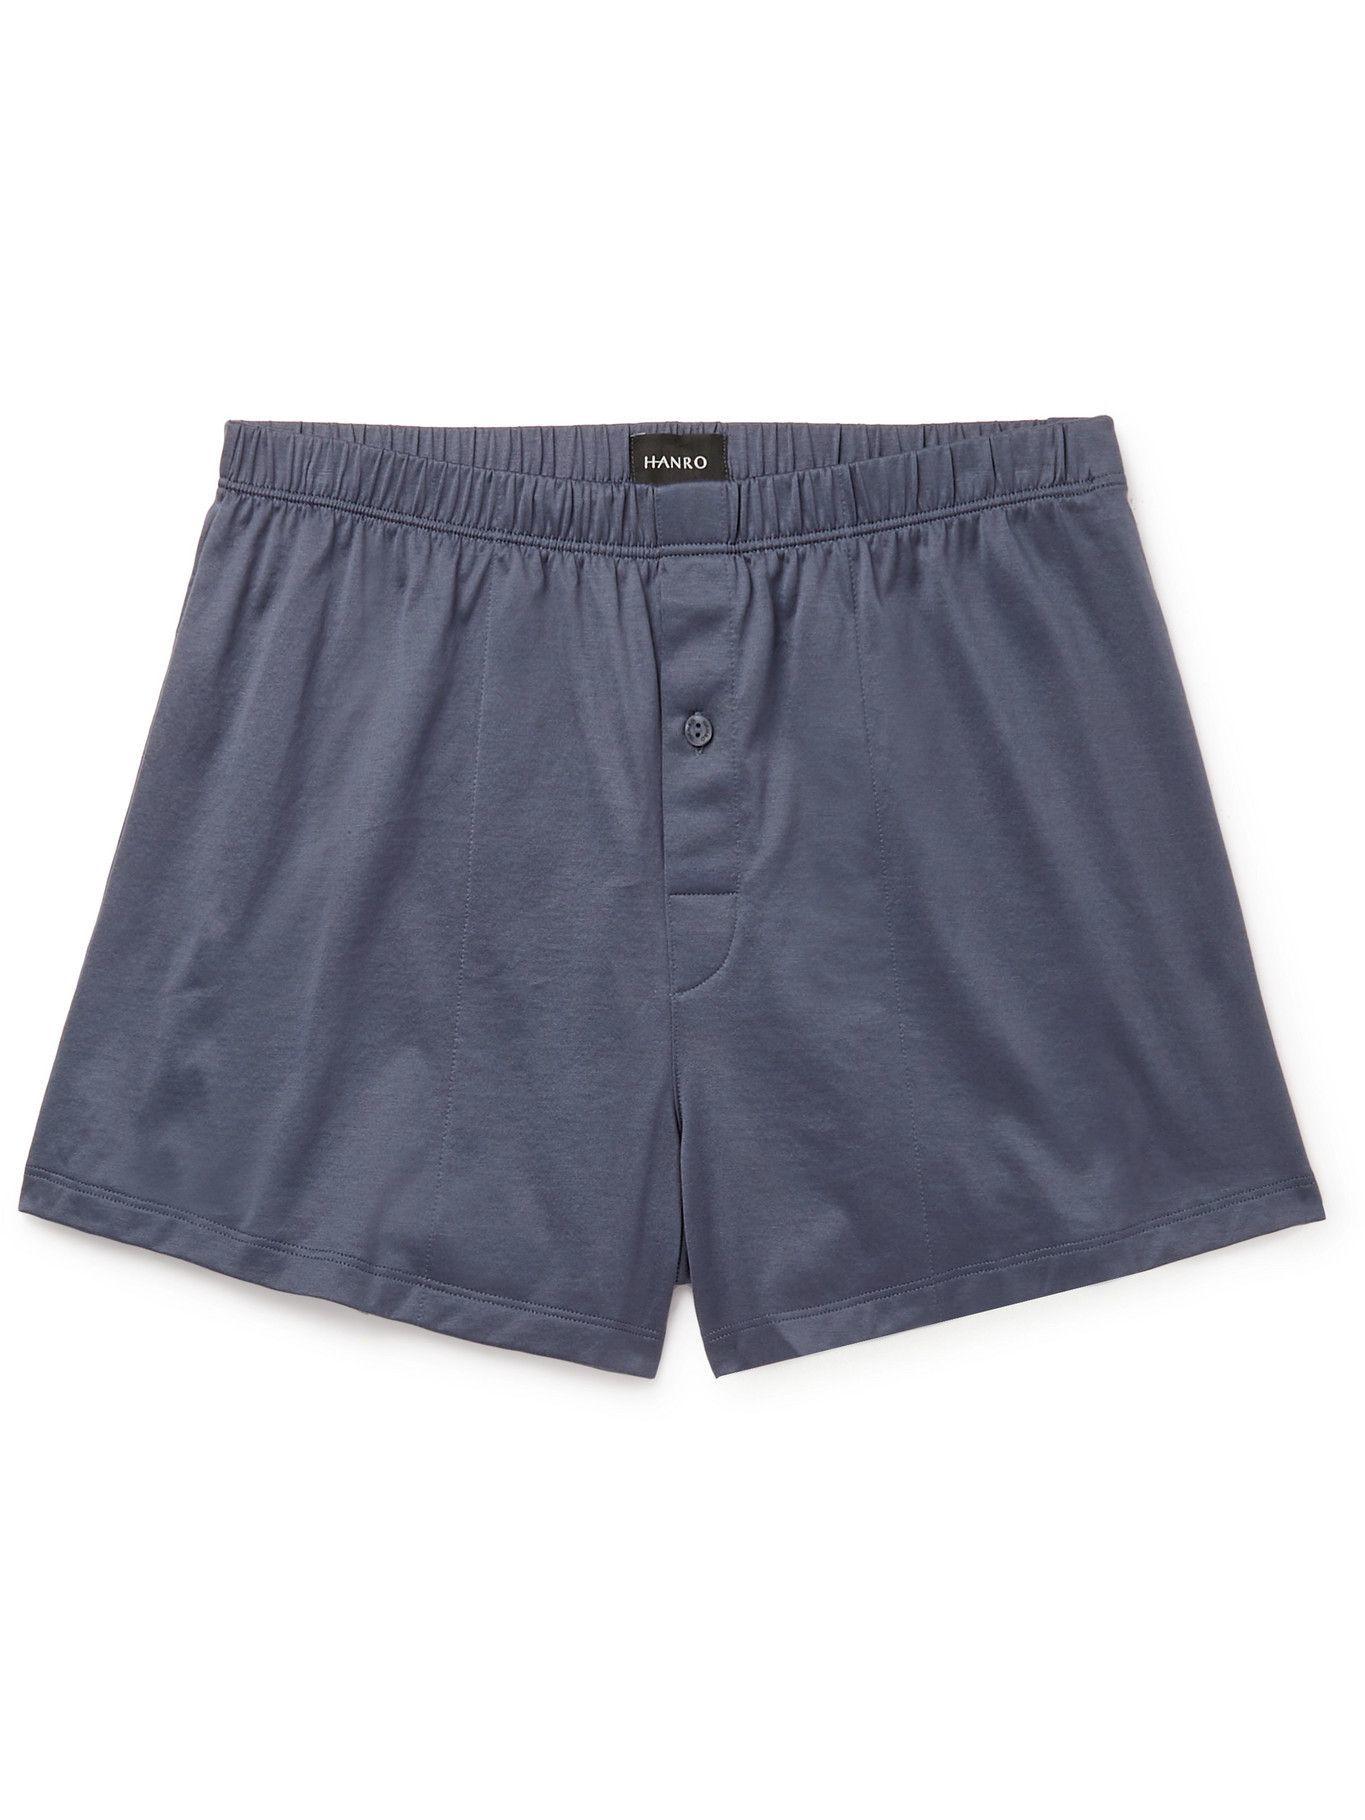 HANRO - Sporty Mercerised Cotton Boxer Shorts - Gray